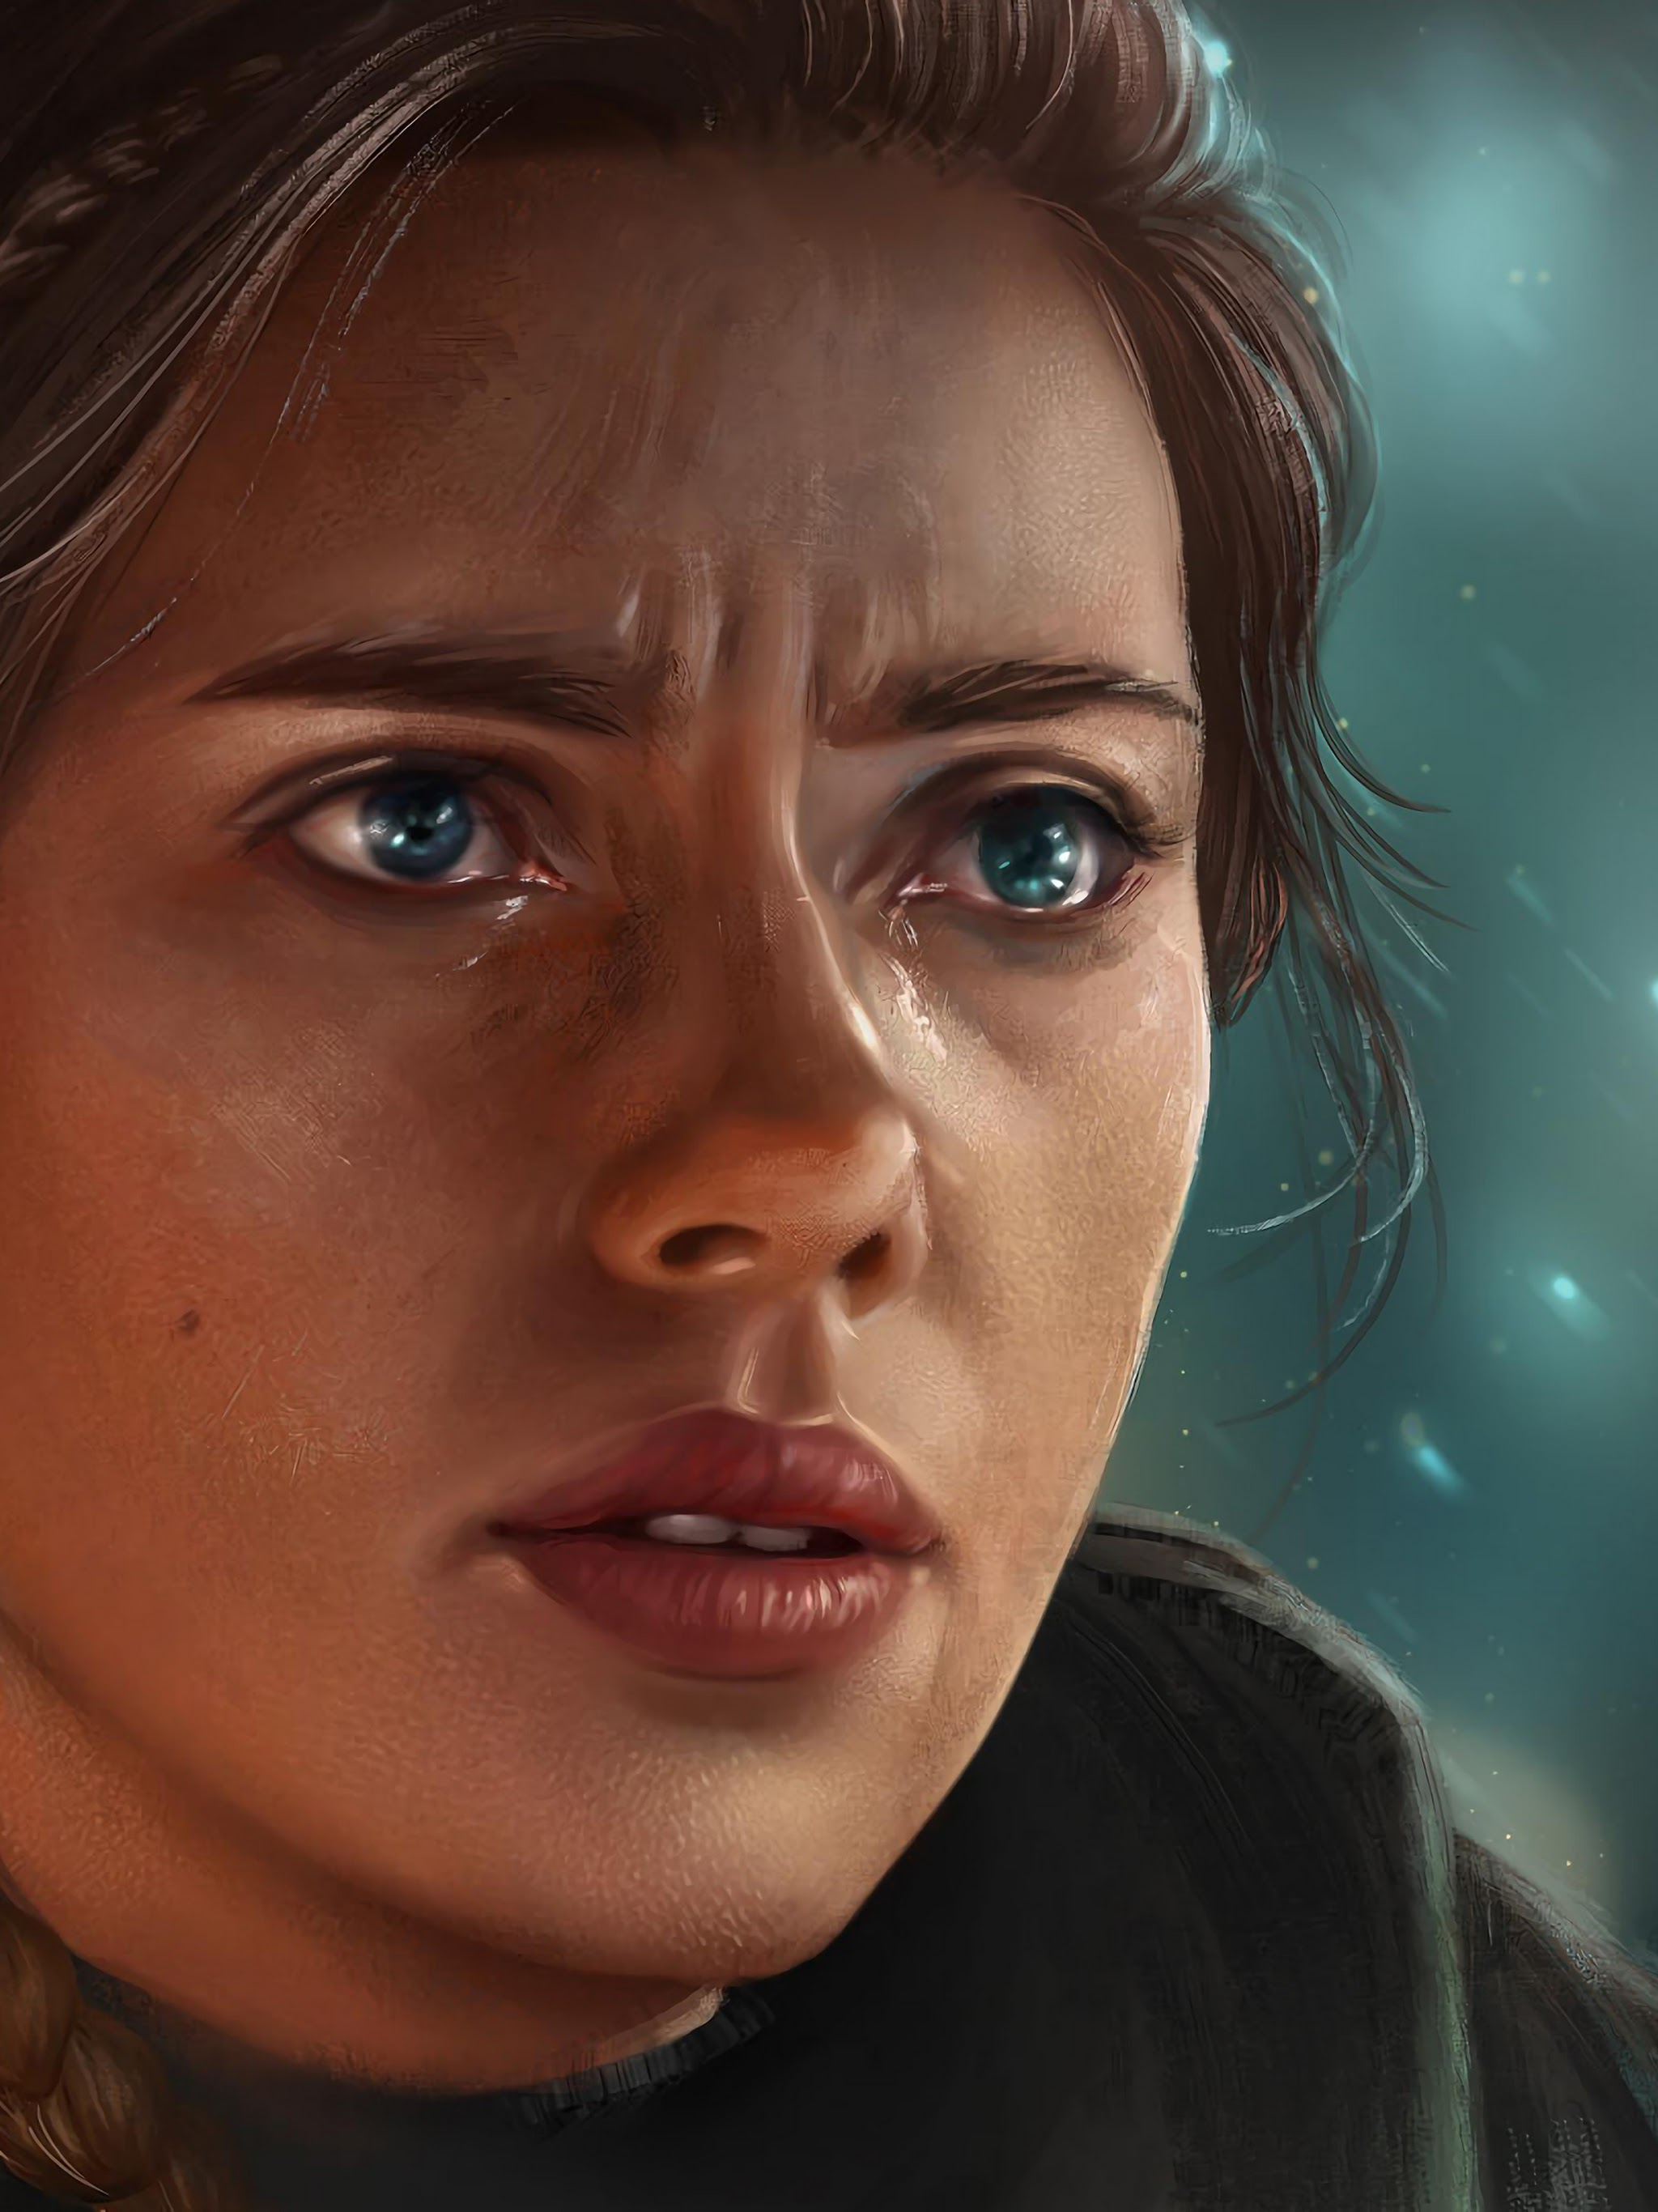 Avengers Endgame Black Widow Natasha Romanoff 4k Wallpaper 147